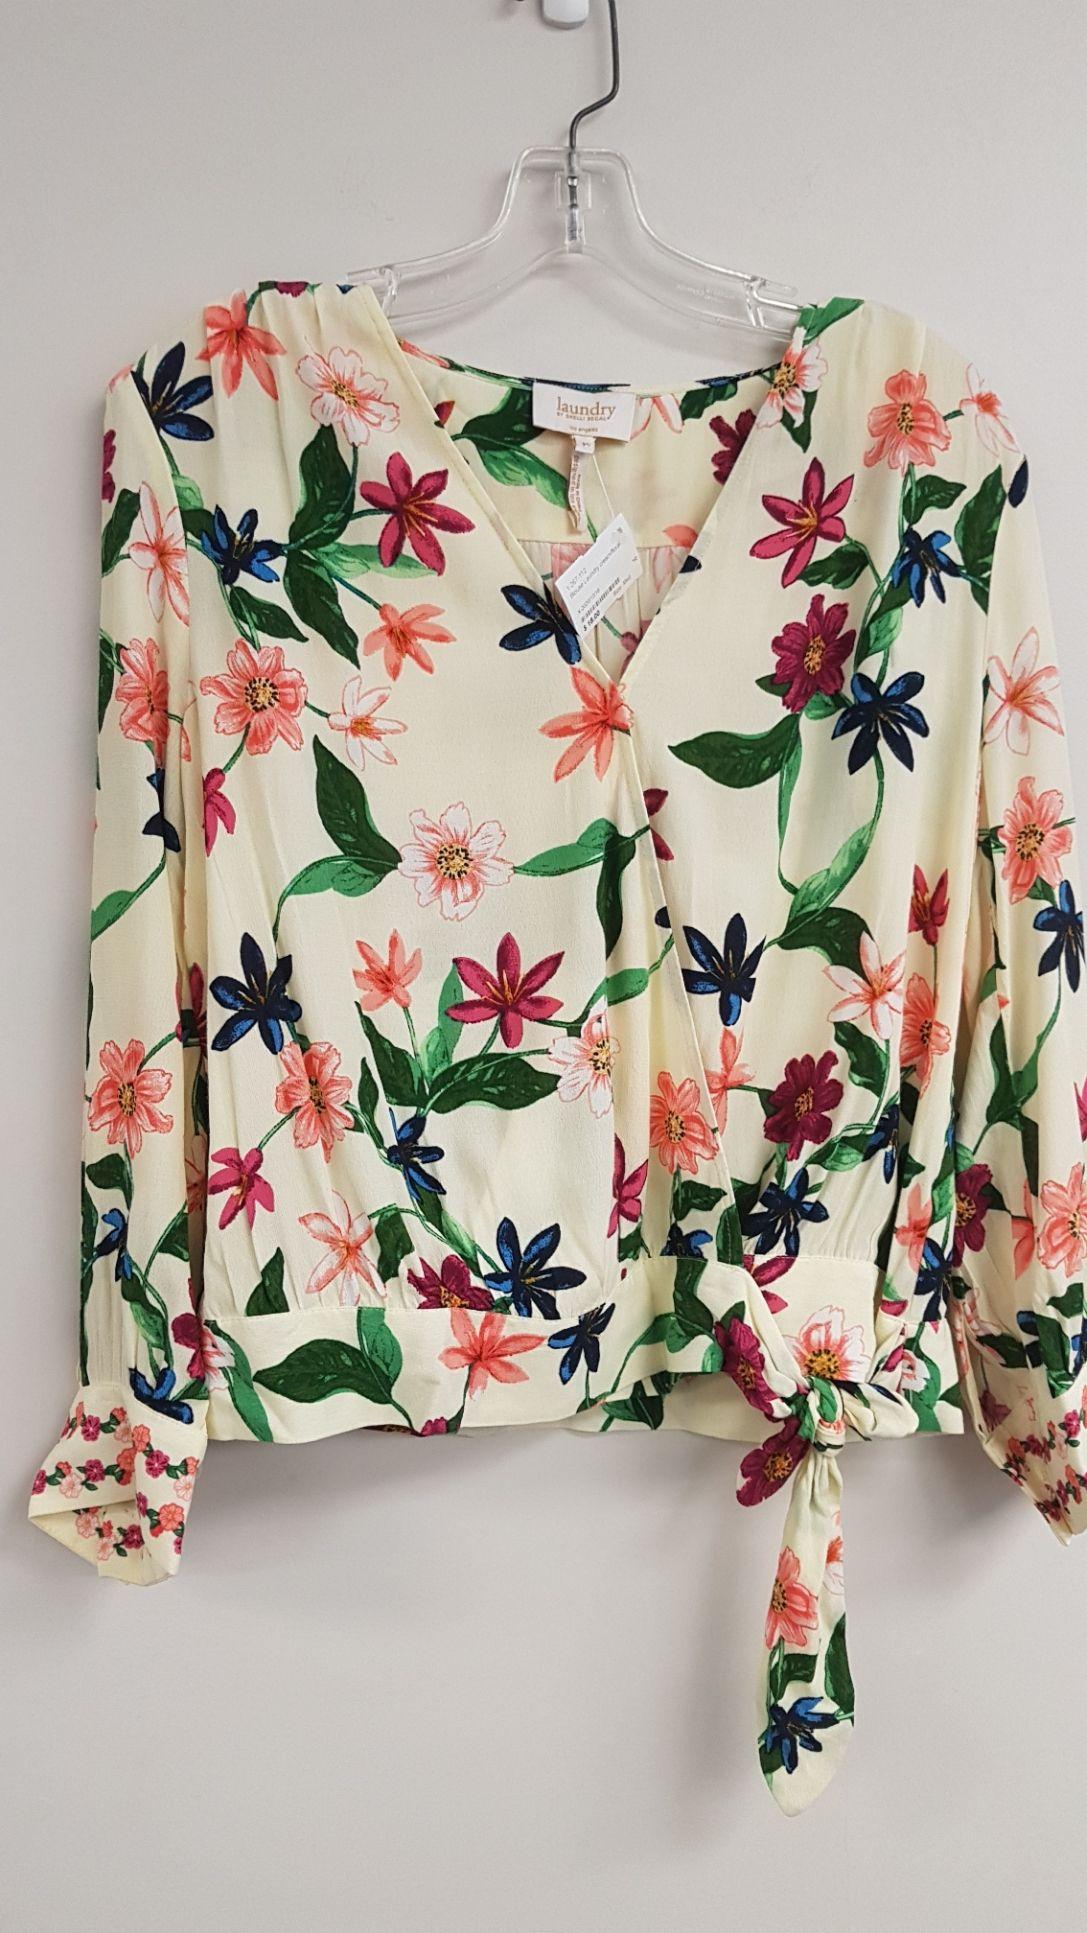 Laundry floral blouse in 2020 Blouse, Fashion, Floral blouse